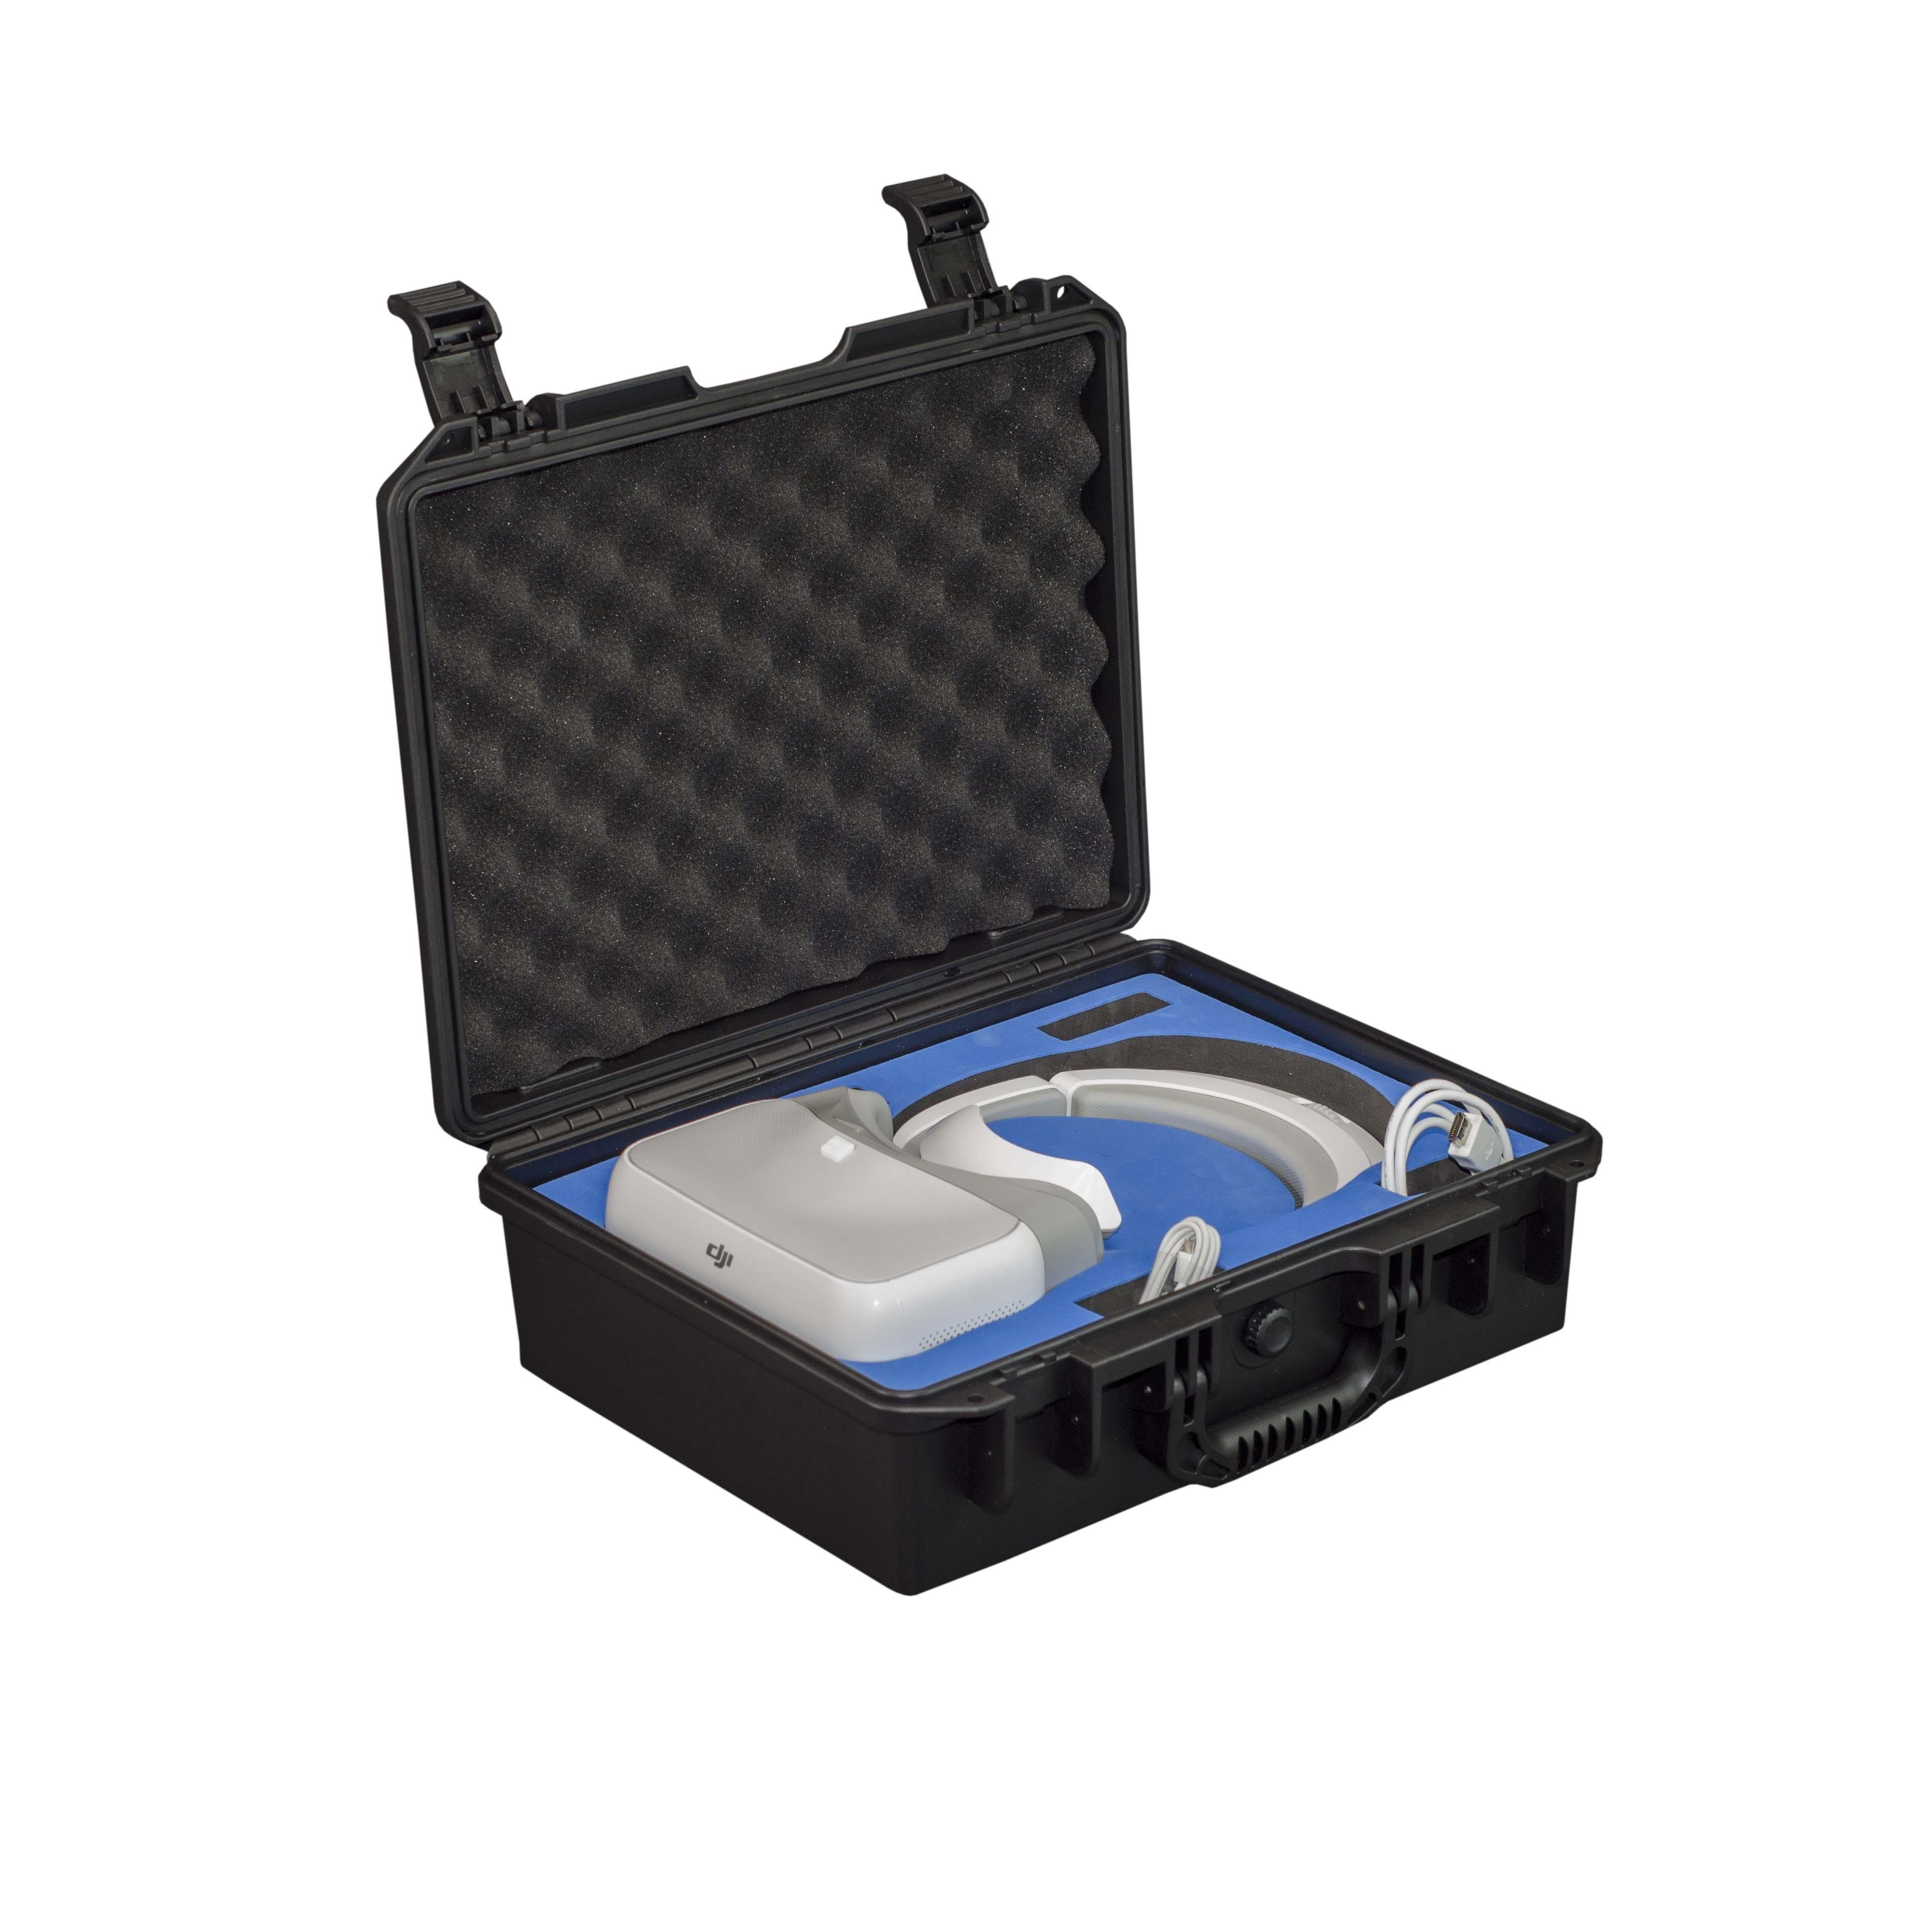 Dji Goggles Waterproof Carry Case Freewell Gear